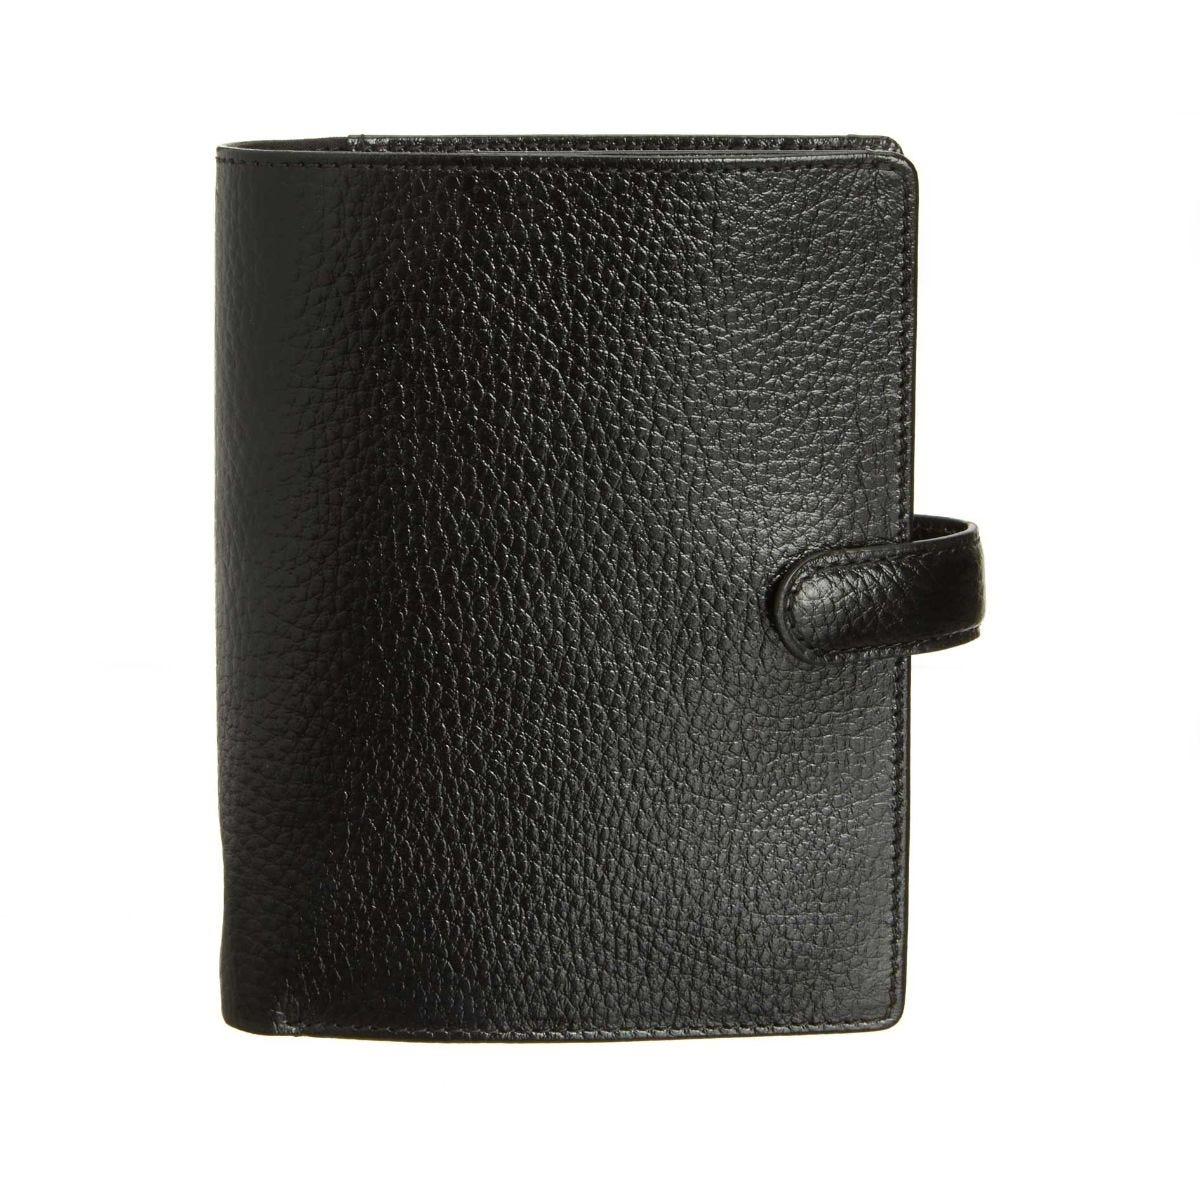 Filofax Finsbury Pocket Organiser Black, Black.